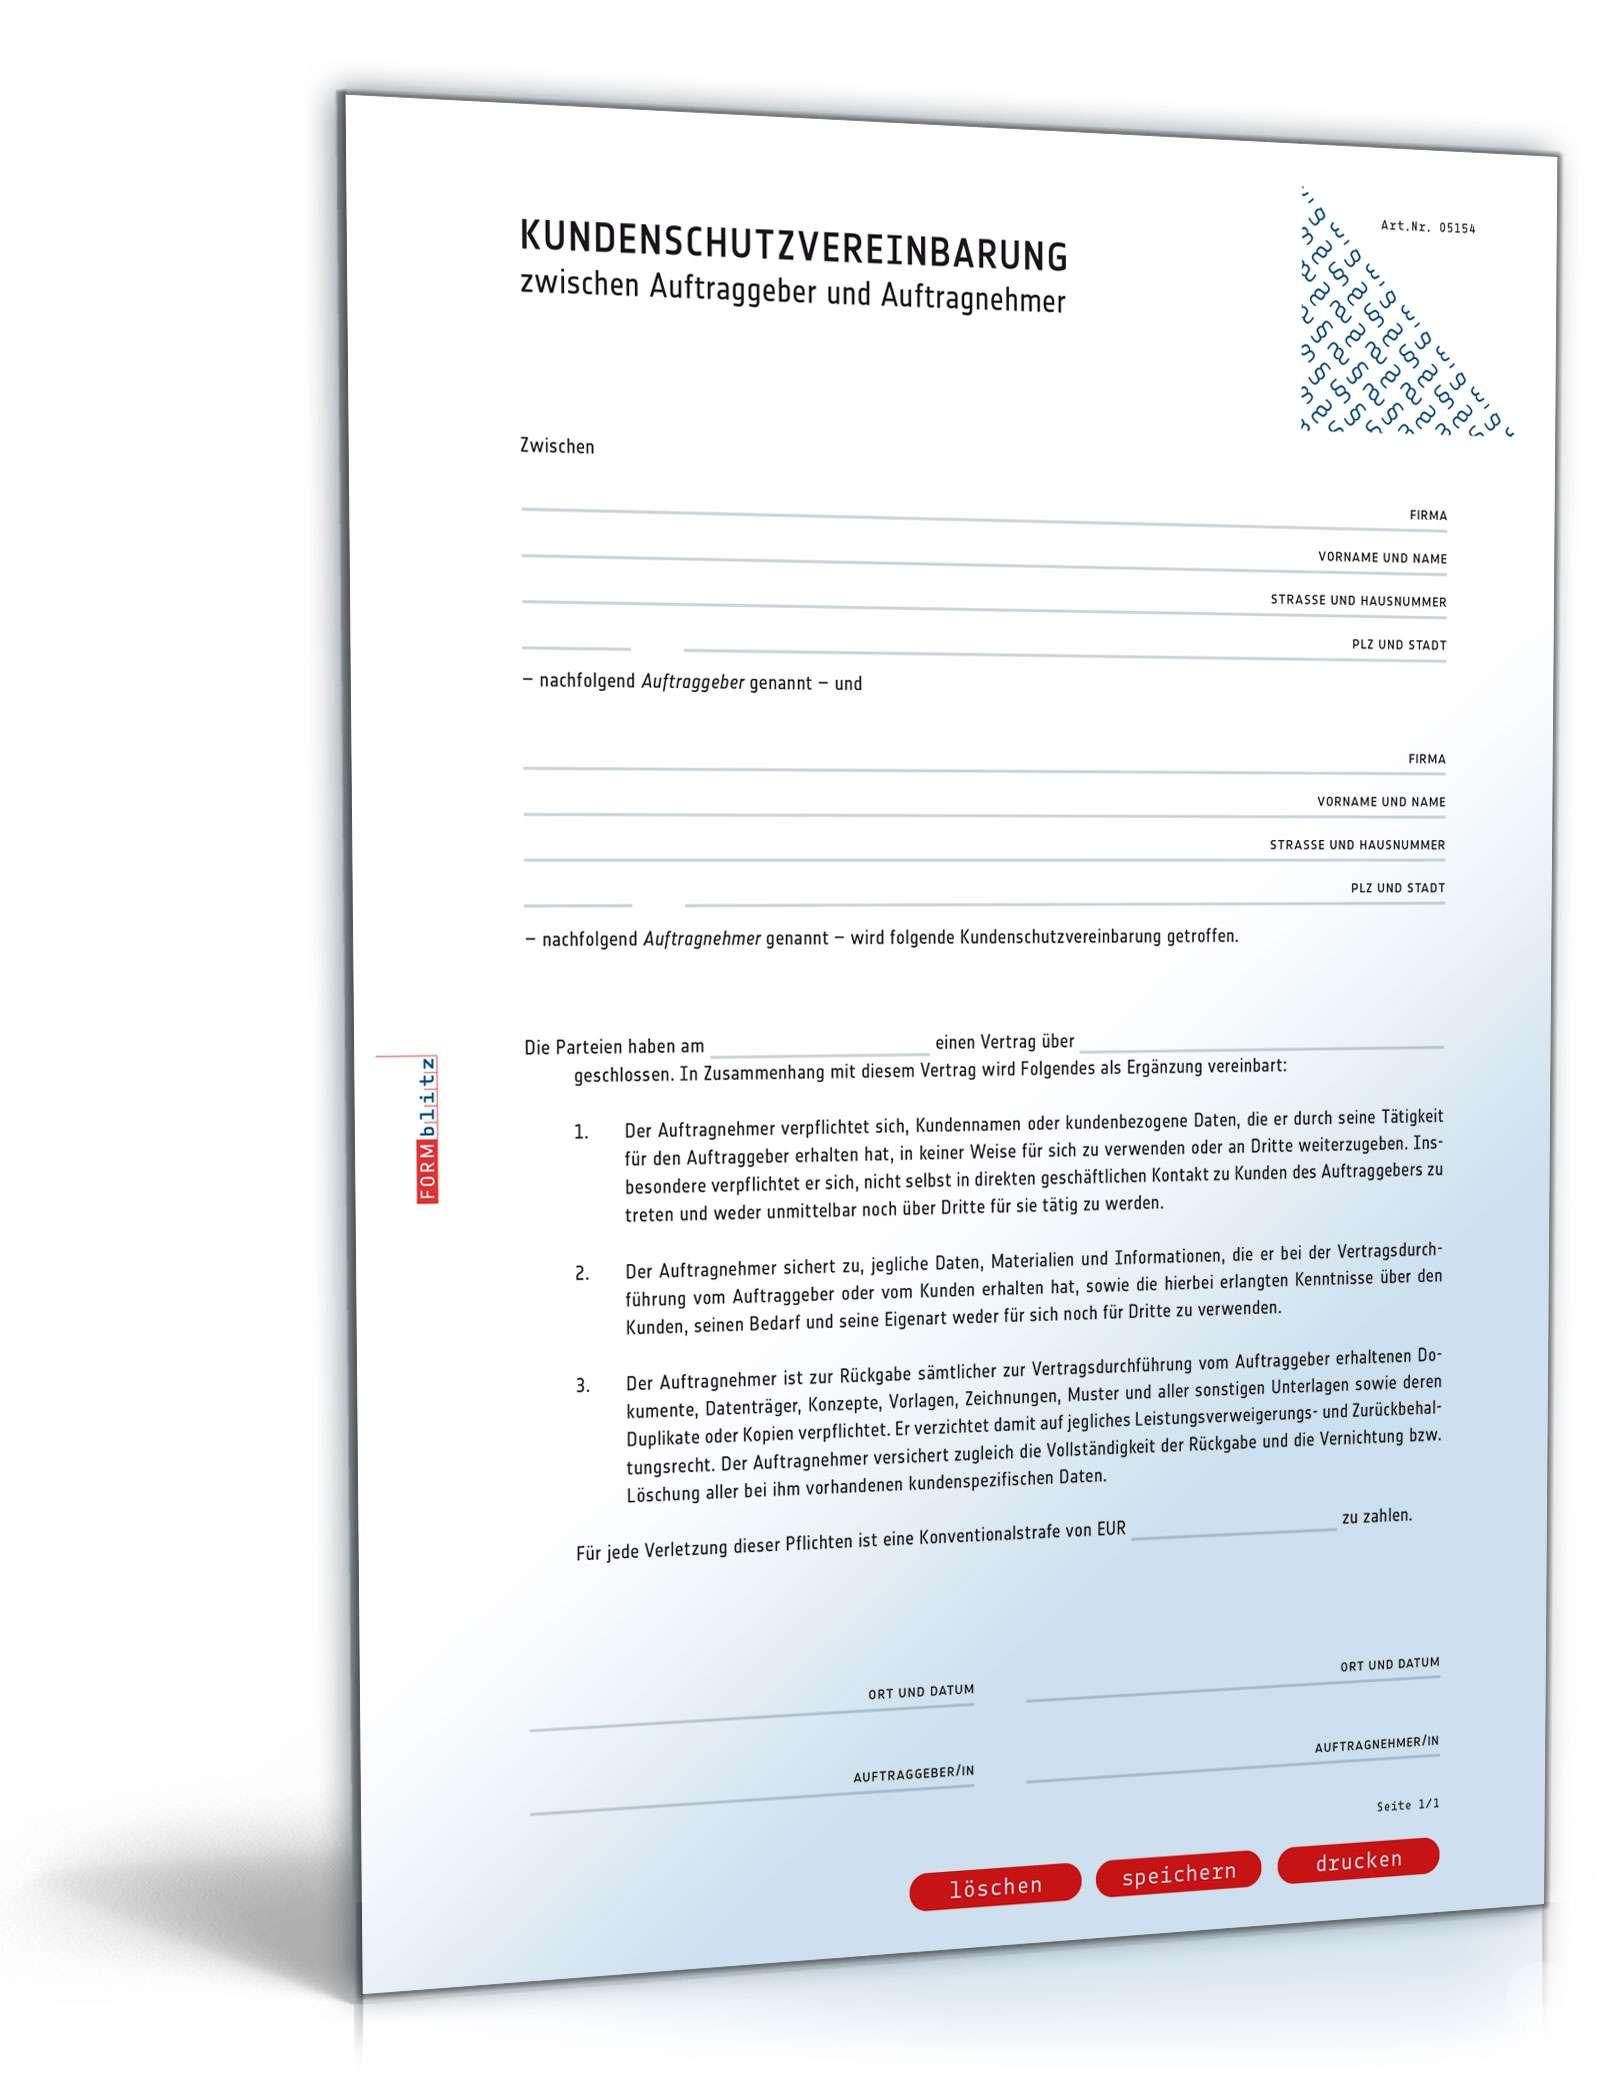 kundenschutzvereinbarung muster zum download. Black Bedroom Furniture Sets. Home Design Ideas